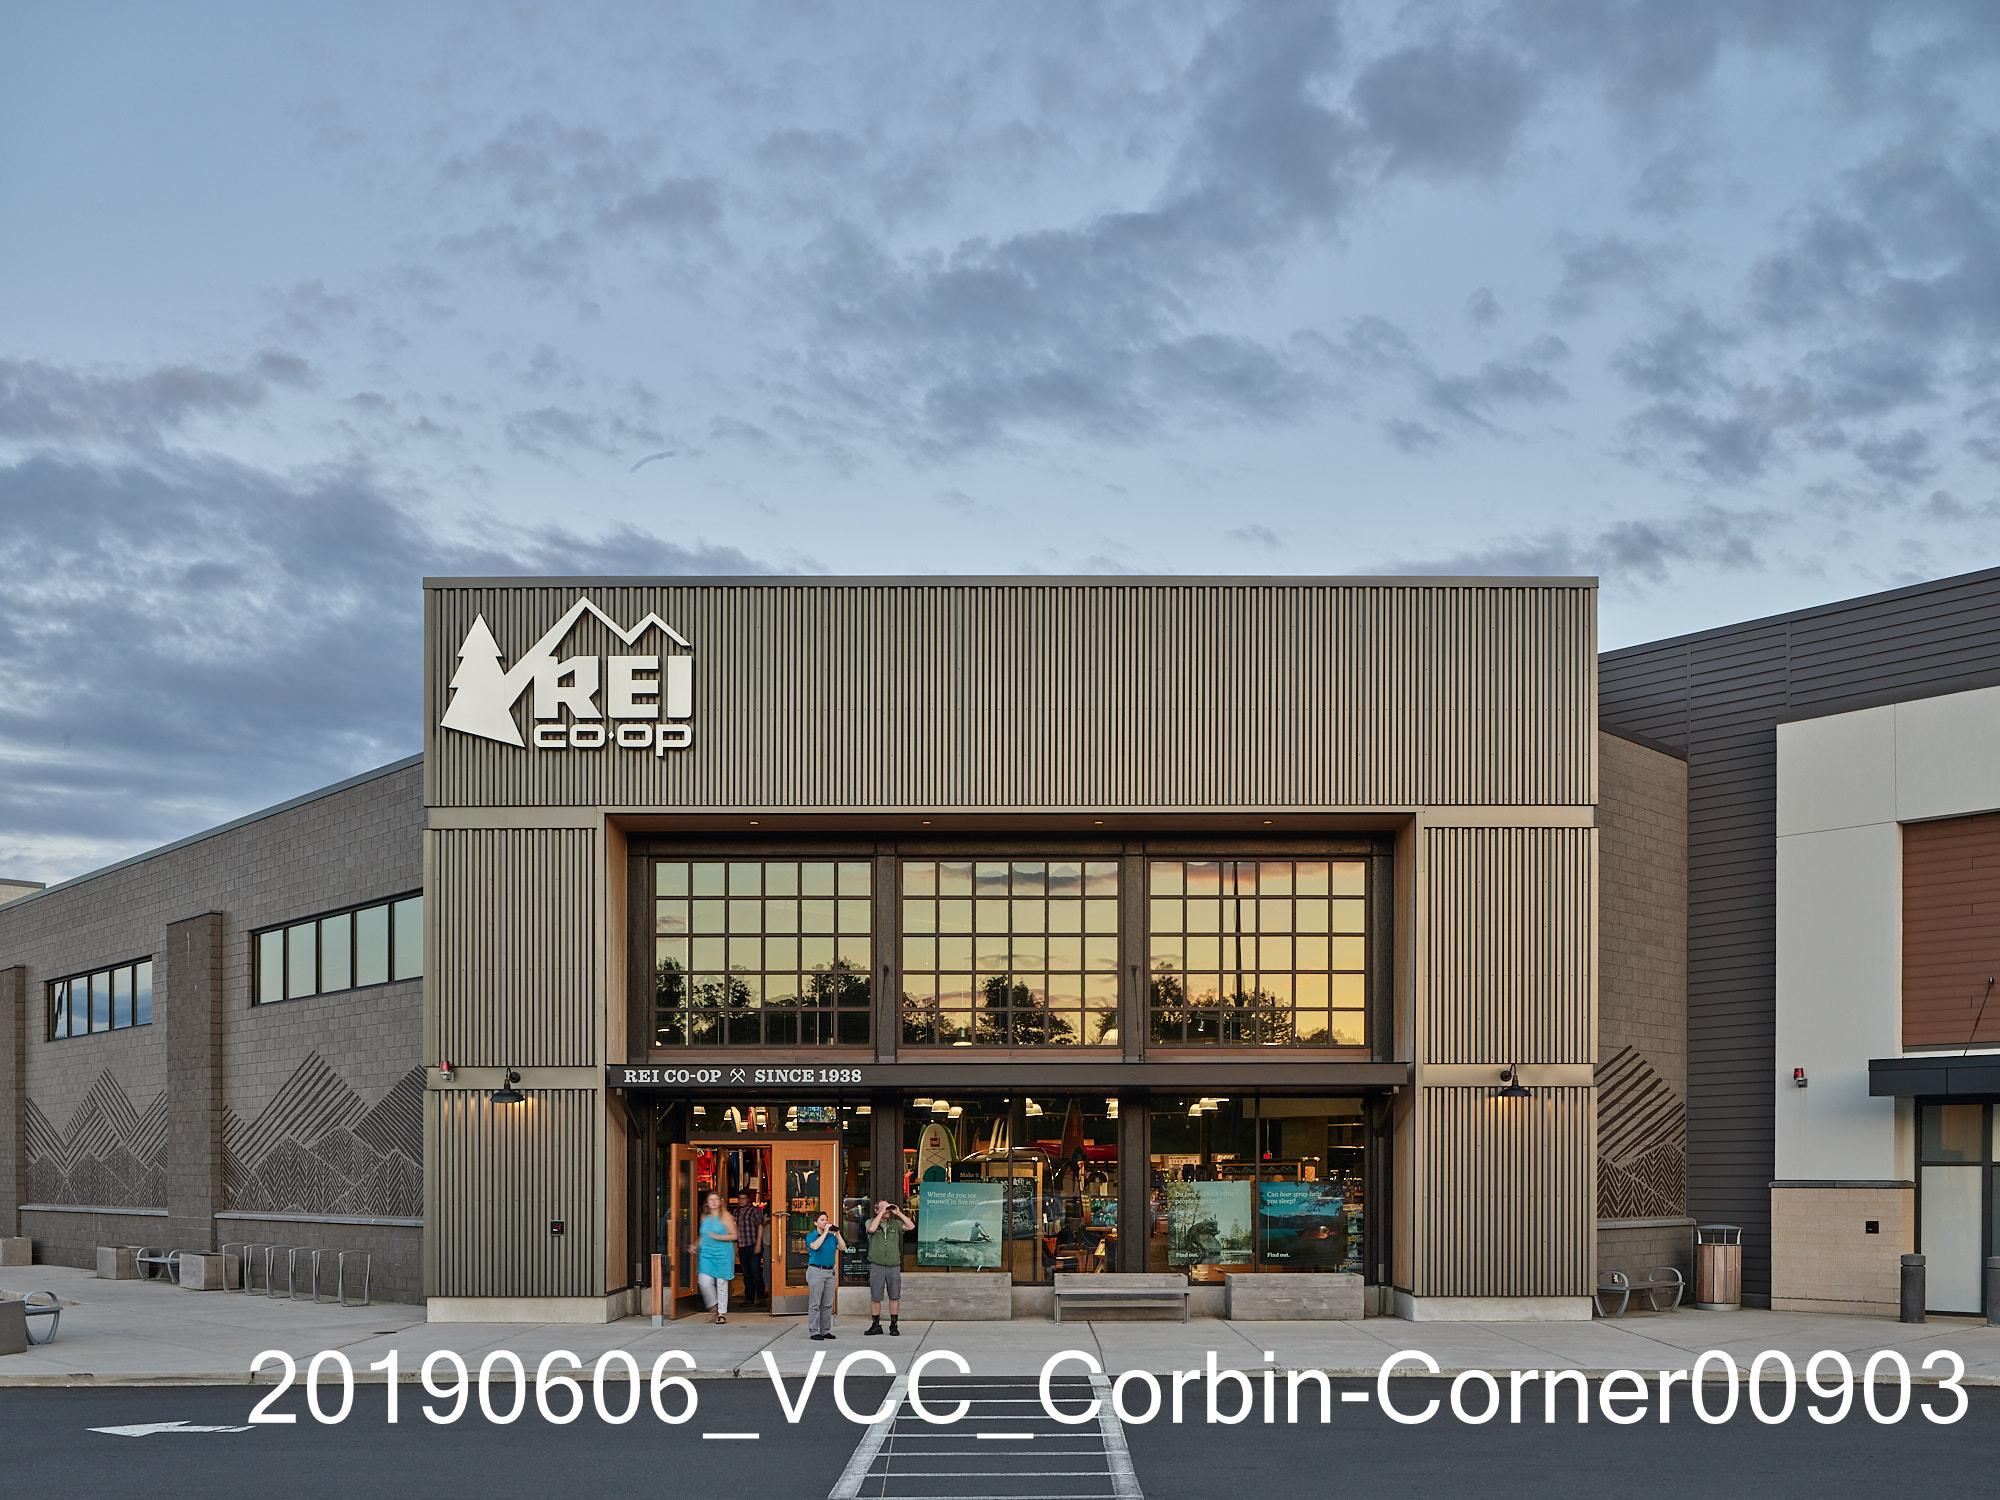 20190606_VCC_Corbin-Corner00903.jpg